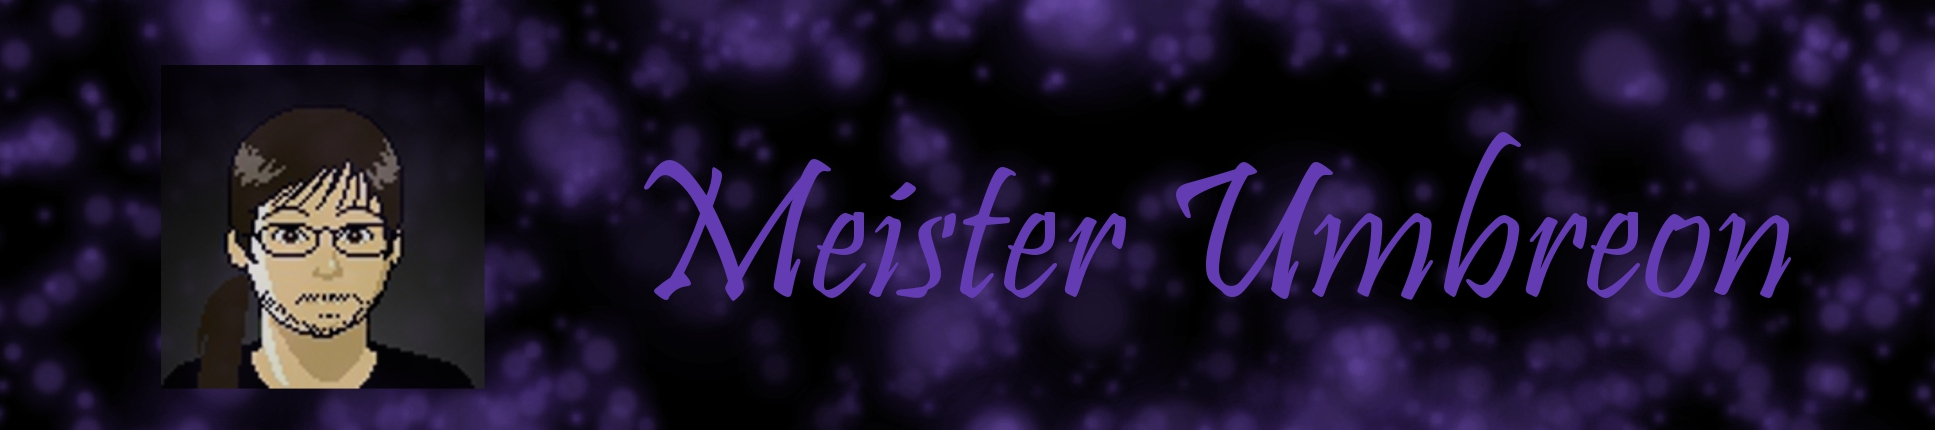 MeisterUmbreon_Logo_purple2.jpg